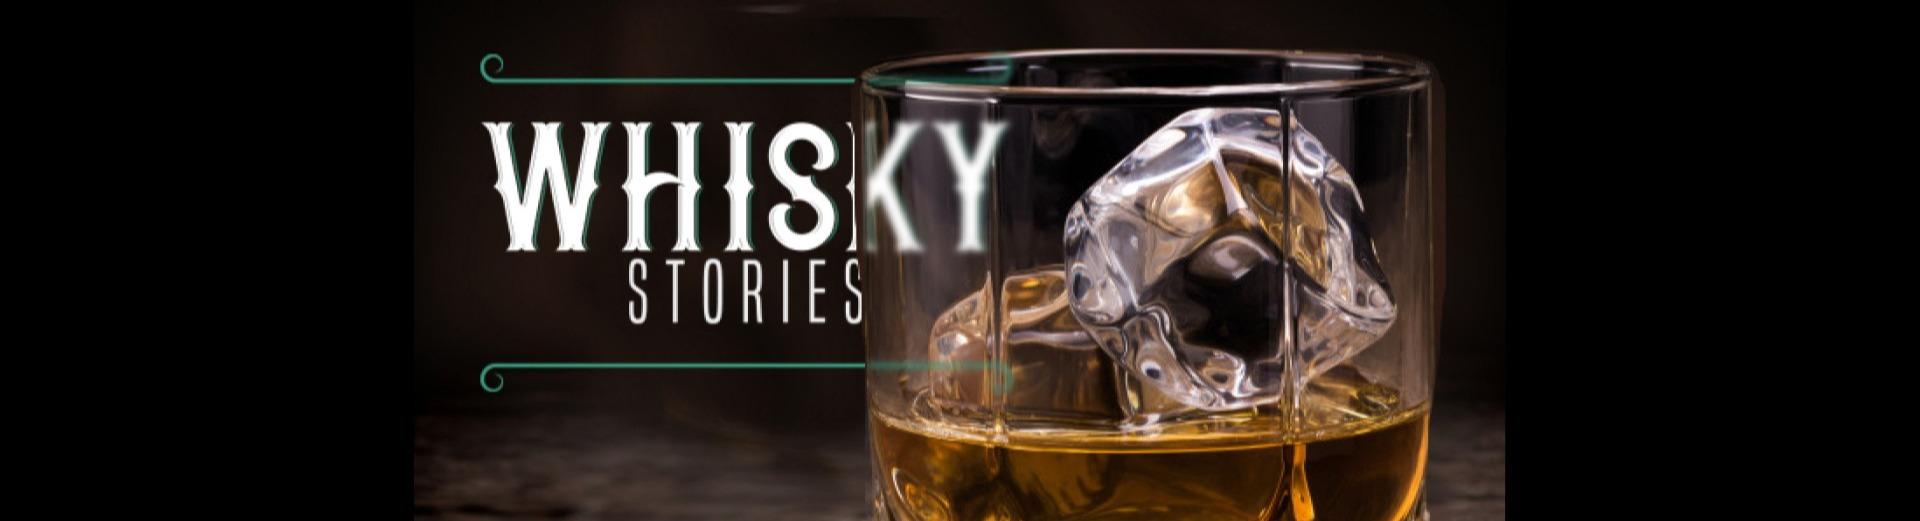 whisky_stories-banner-2